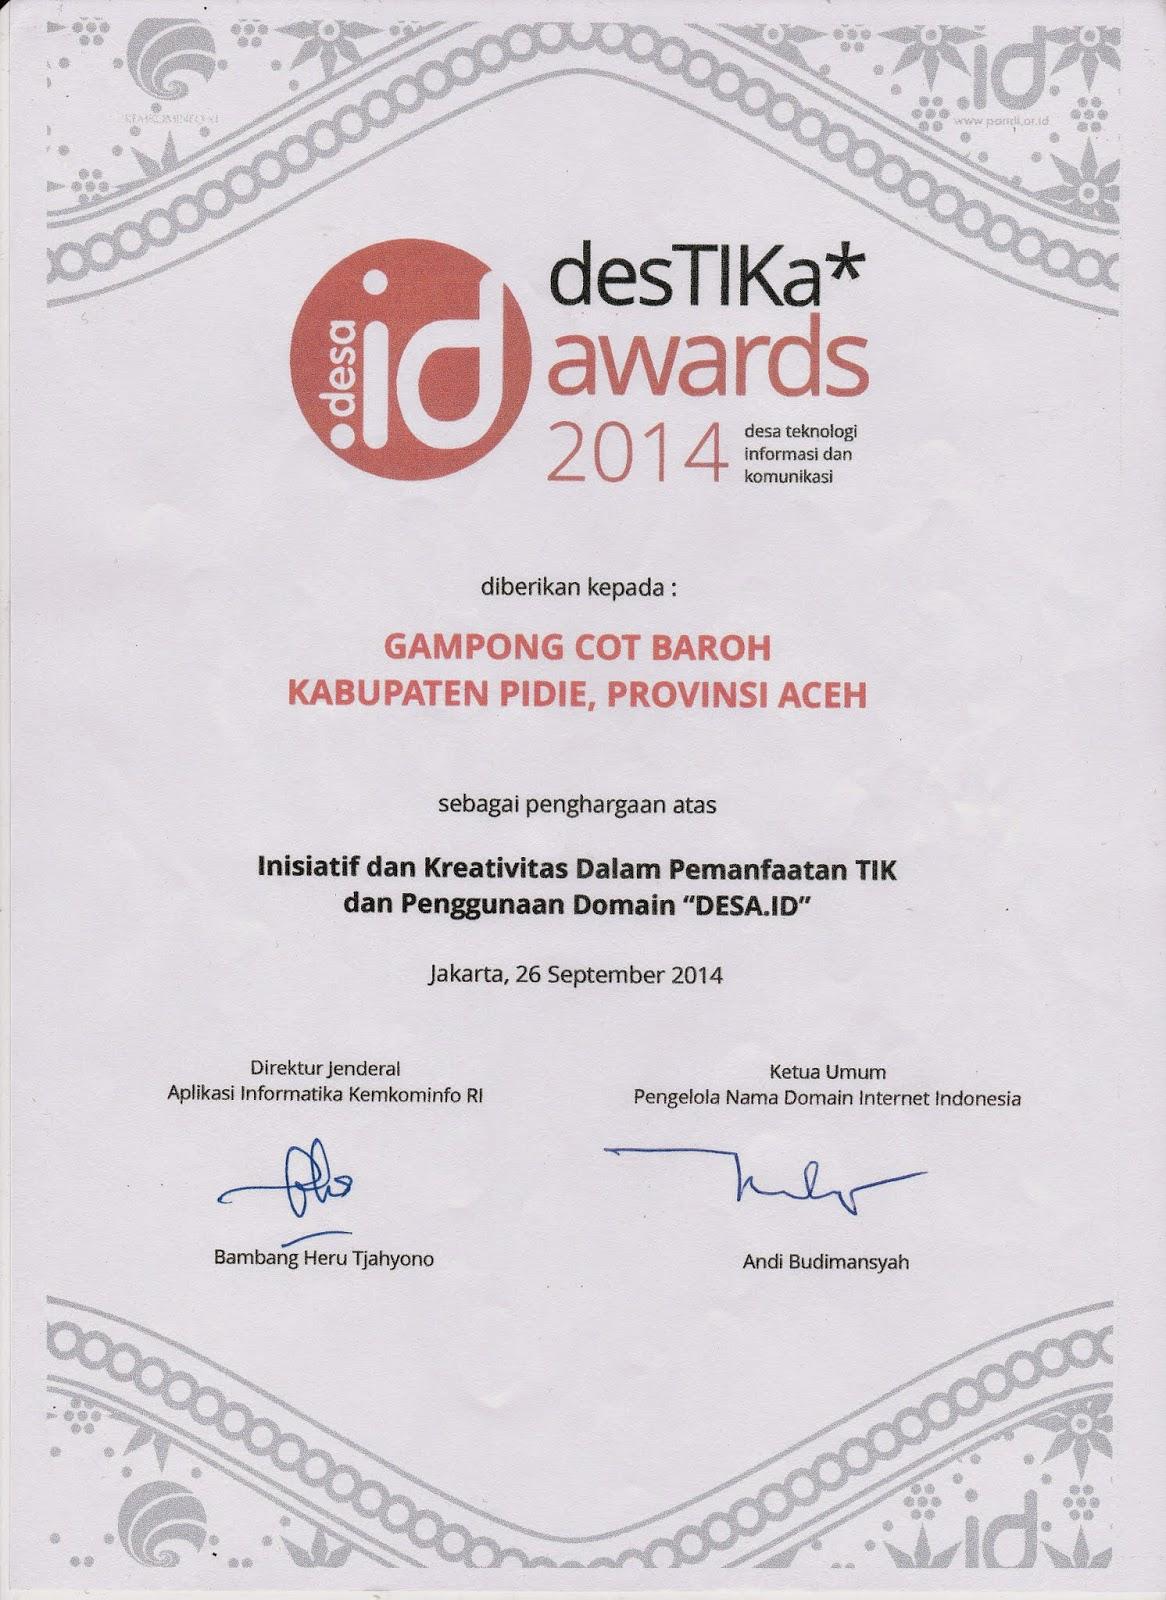 Gampong Cot Baroh Mendapatkan Destika Awards 2014